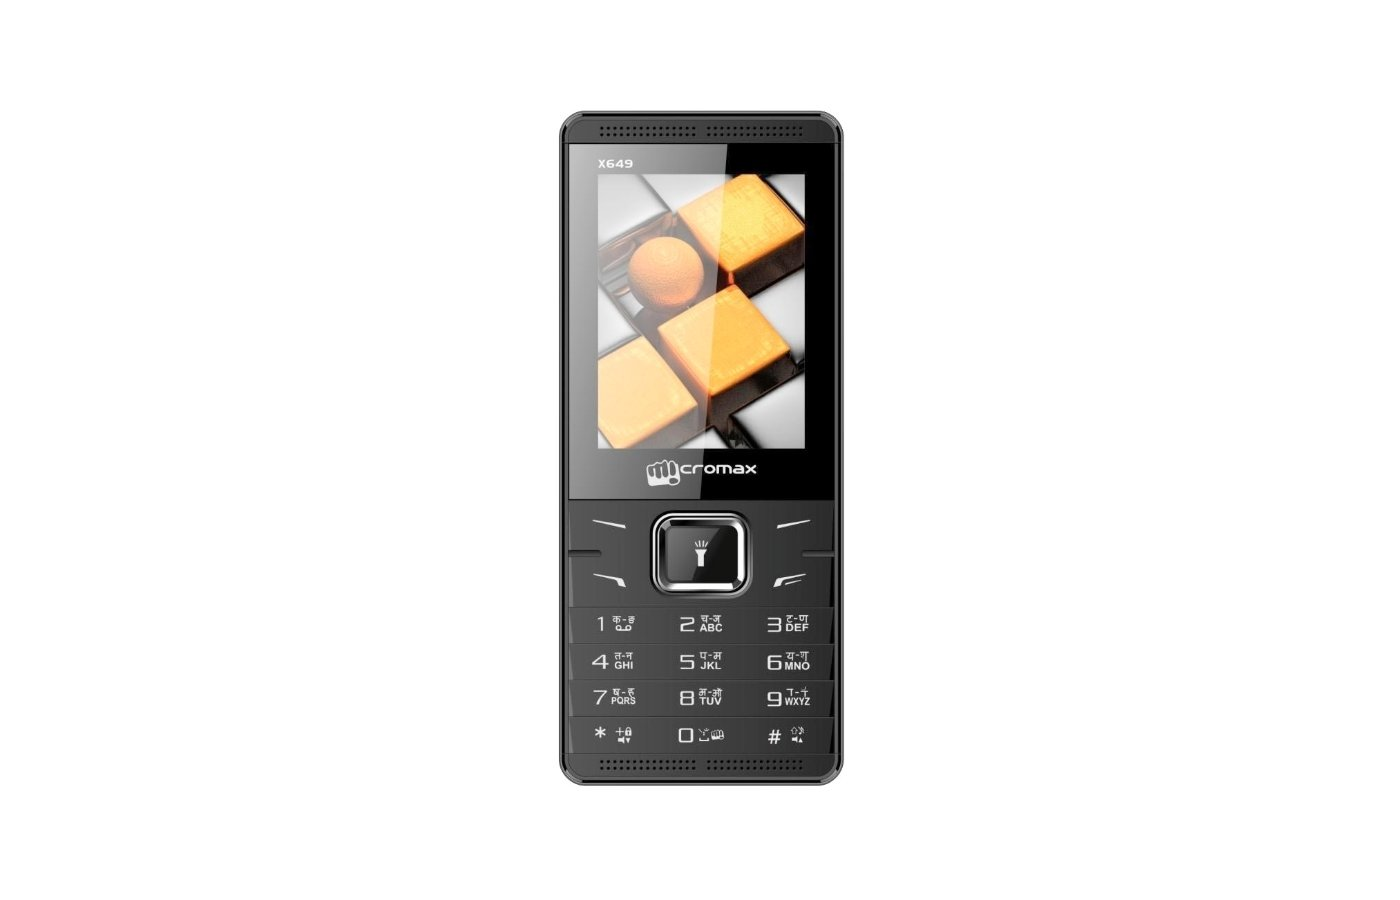 Мобильный телефон Micromax X649 Black